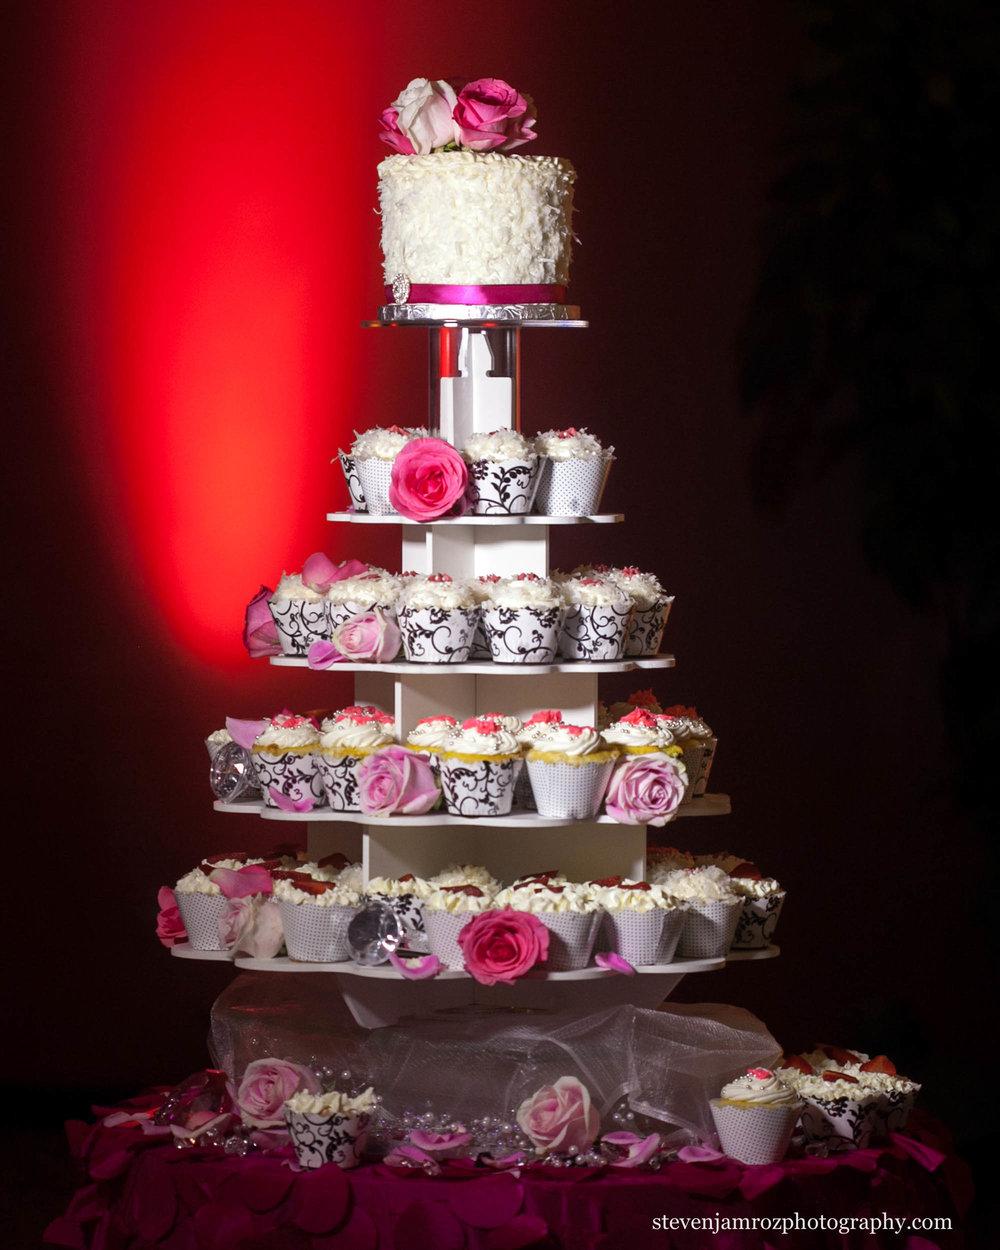 cupcakes-wedding-instead-of-cake-steven-jamroz-0691.jpg